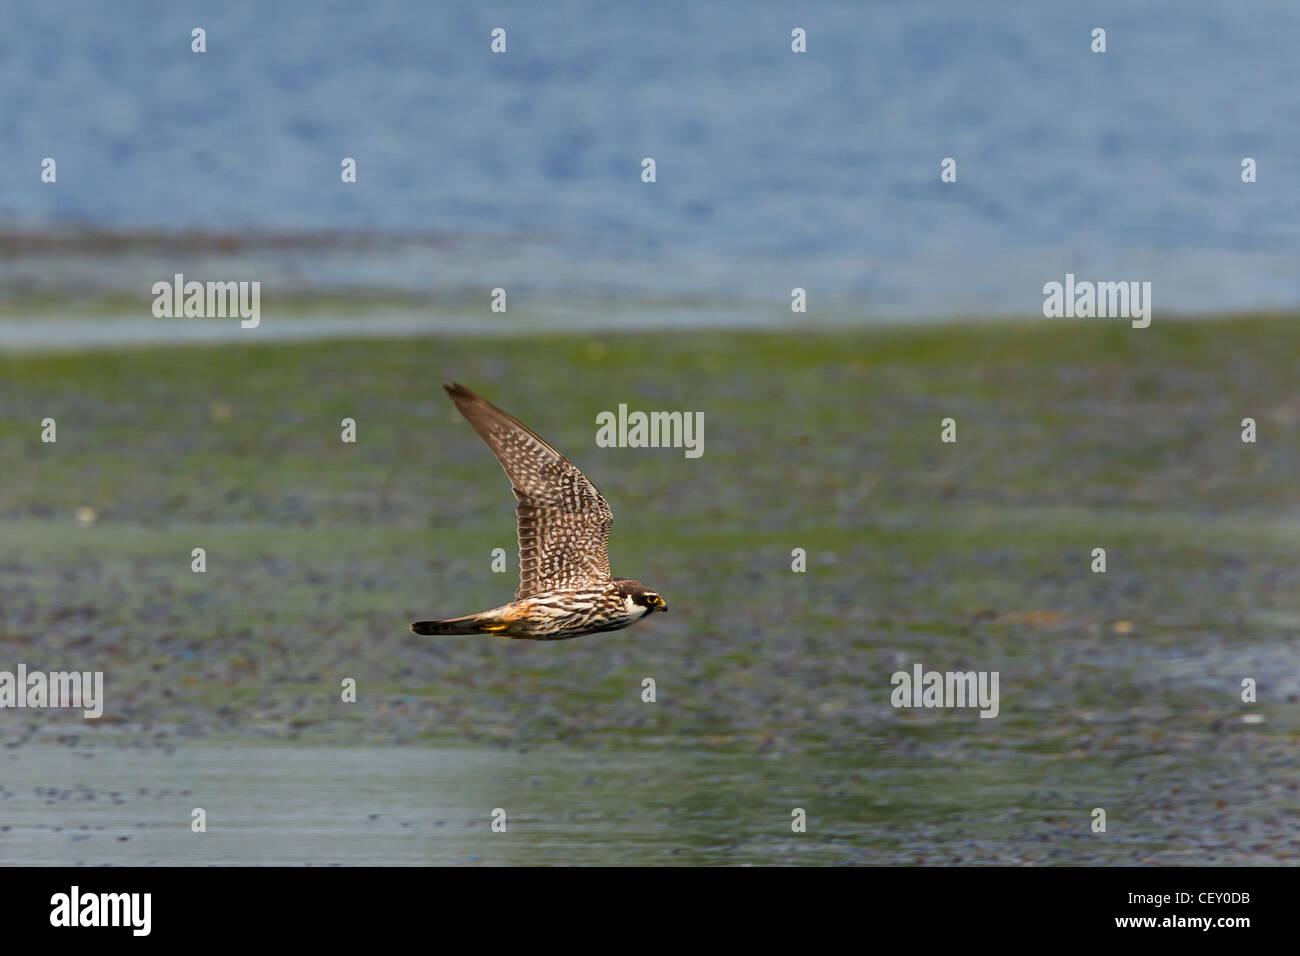 Eurasian Hobby (Falco subbuteo) chasing dragonflies above lake, Germany - Stock Image